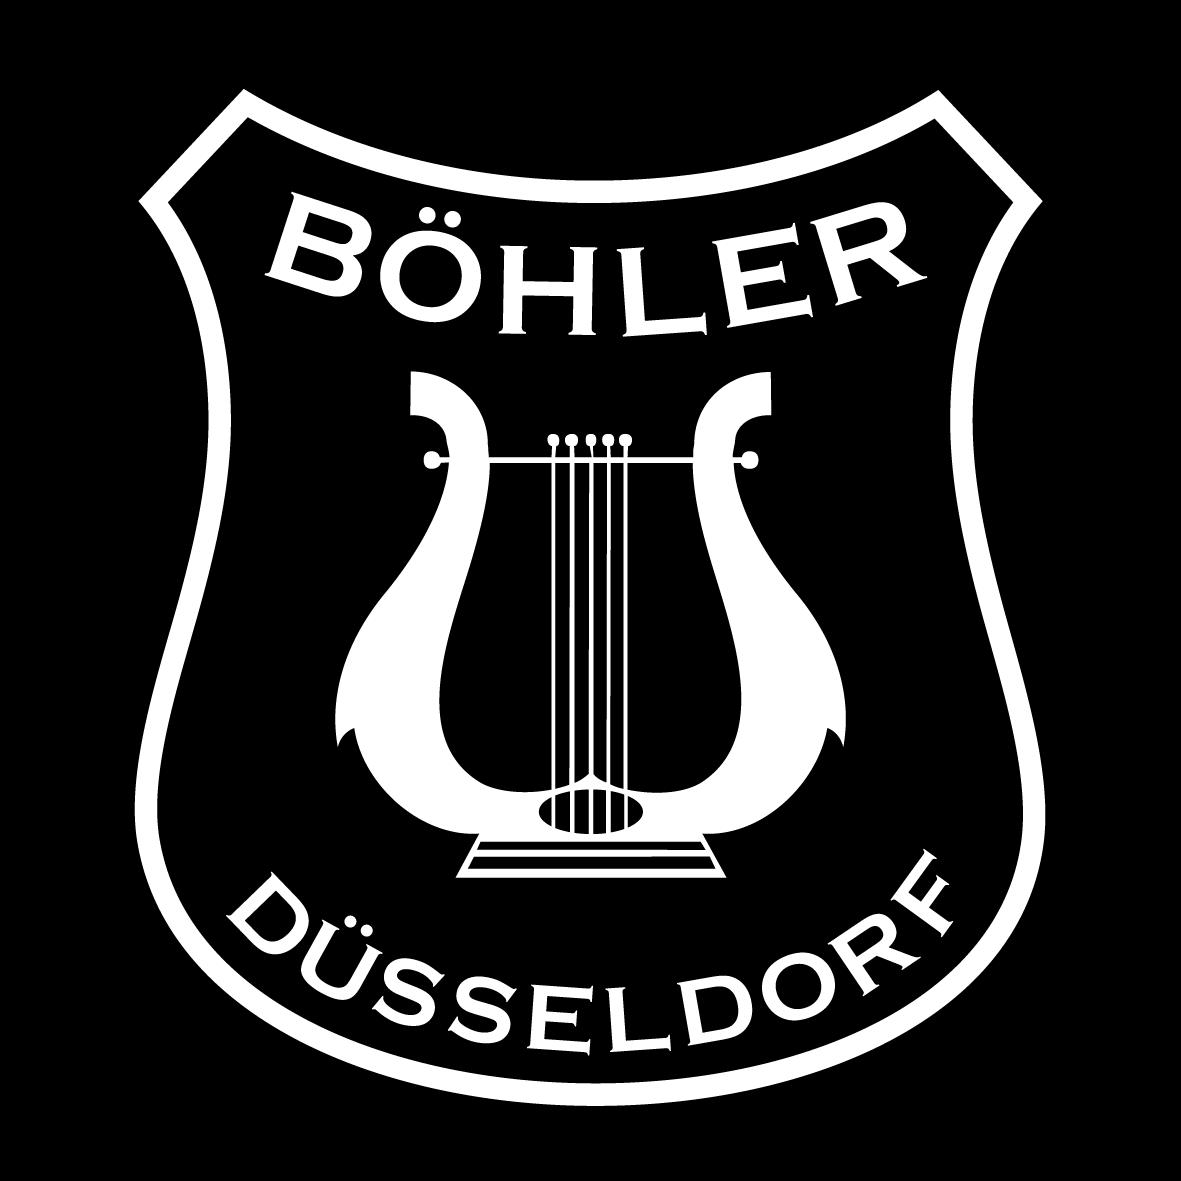 Werkskapelle Böhler Düsseldorf